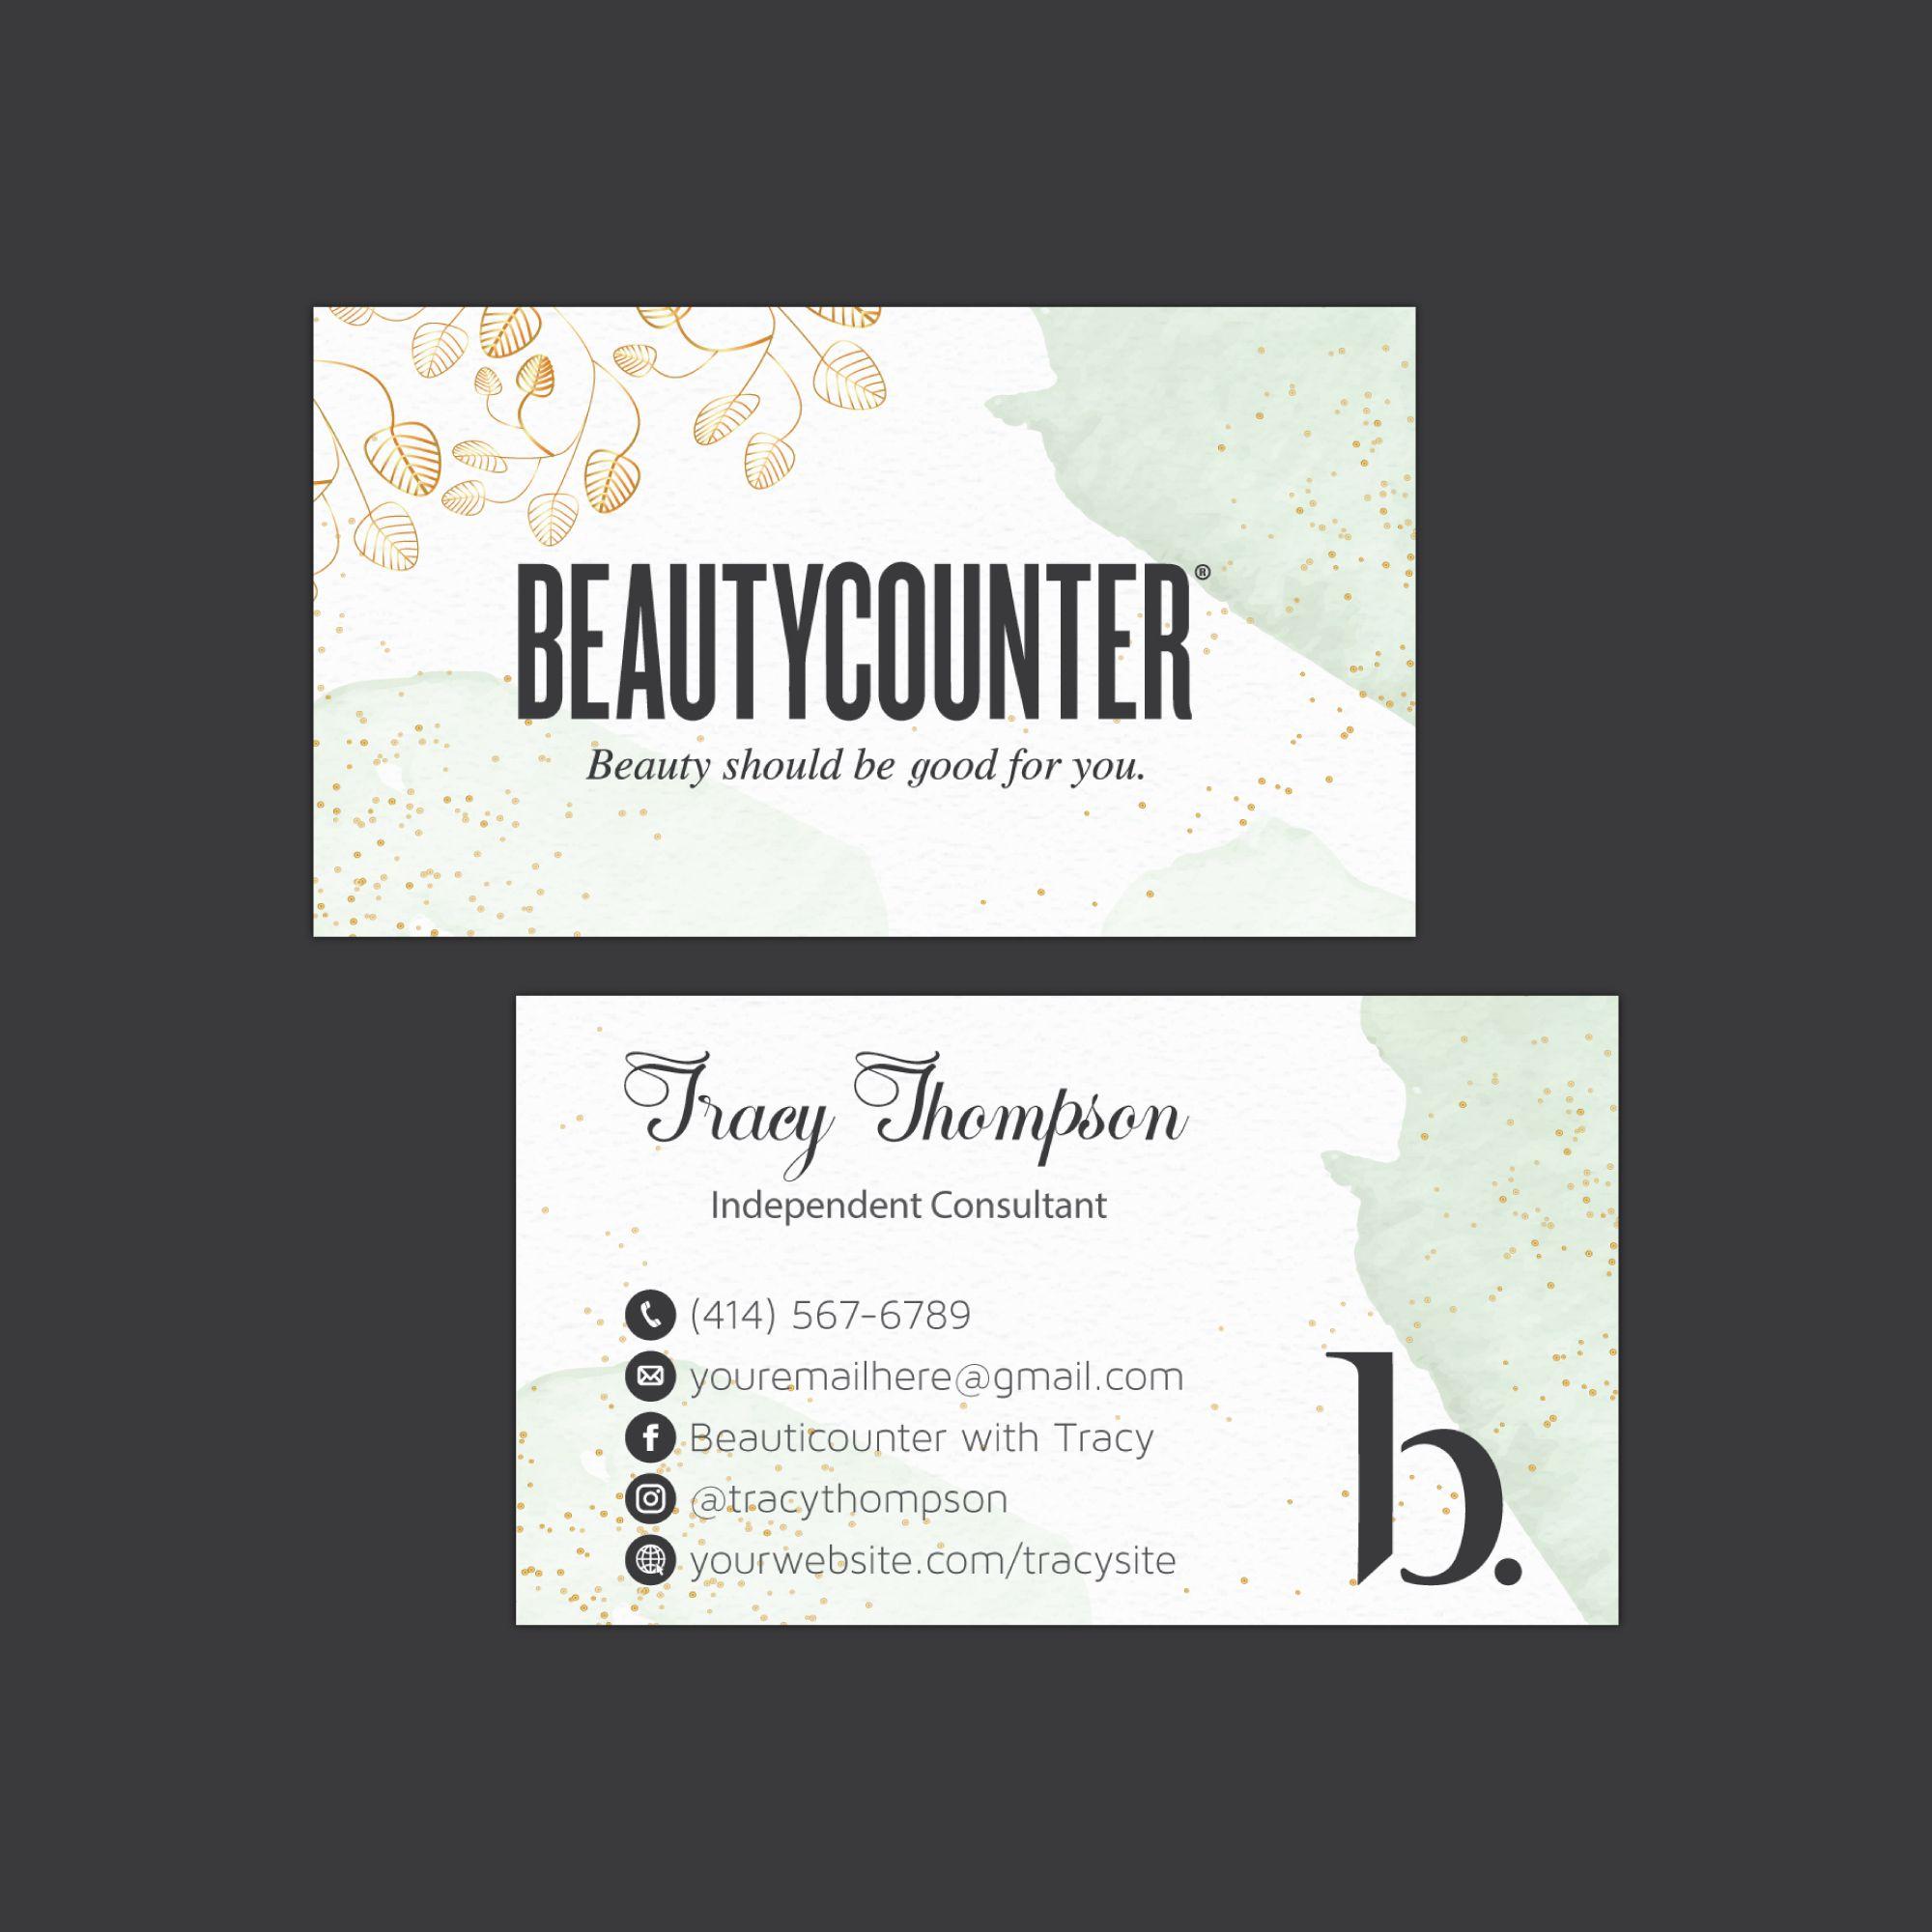 Watercolor Beautycounter Business Card Business Card Personalized Beautycounter Business Card Printable Card Bc40 Beautycounter Business Printable Business Cards Beautycounter